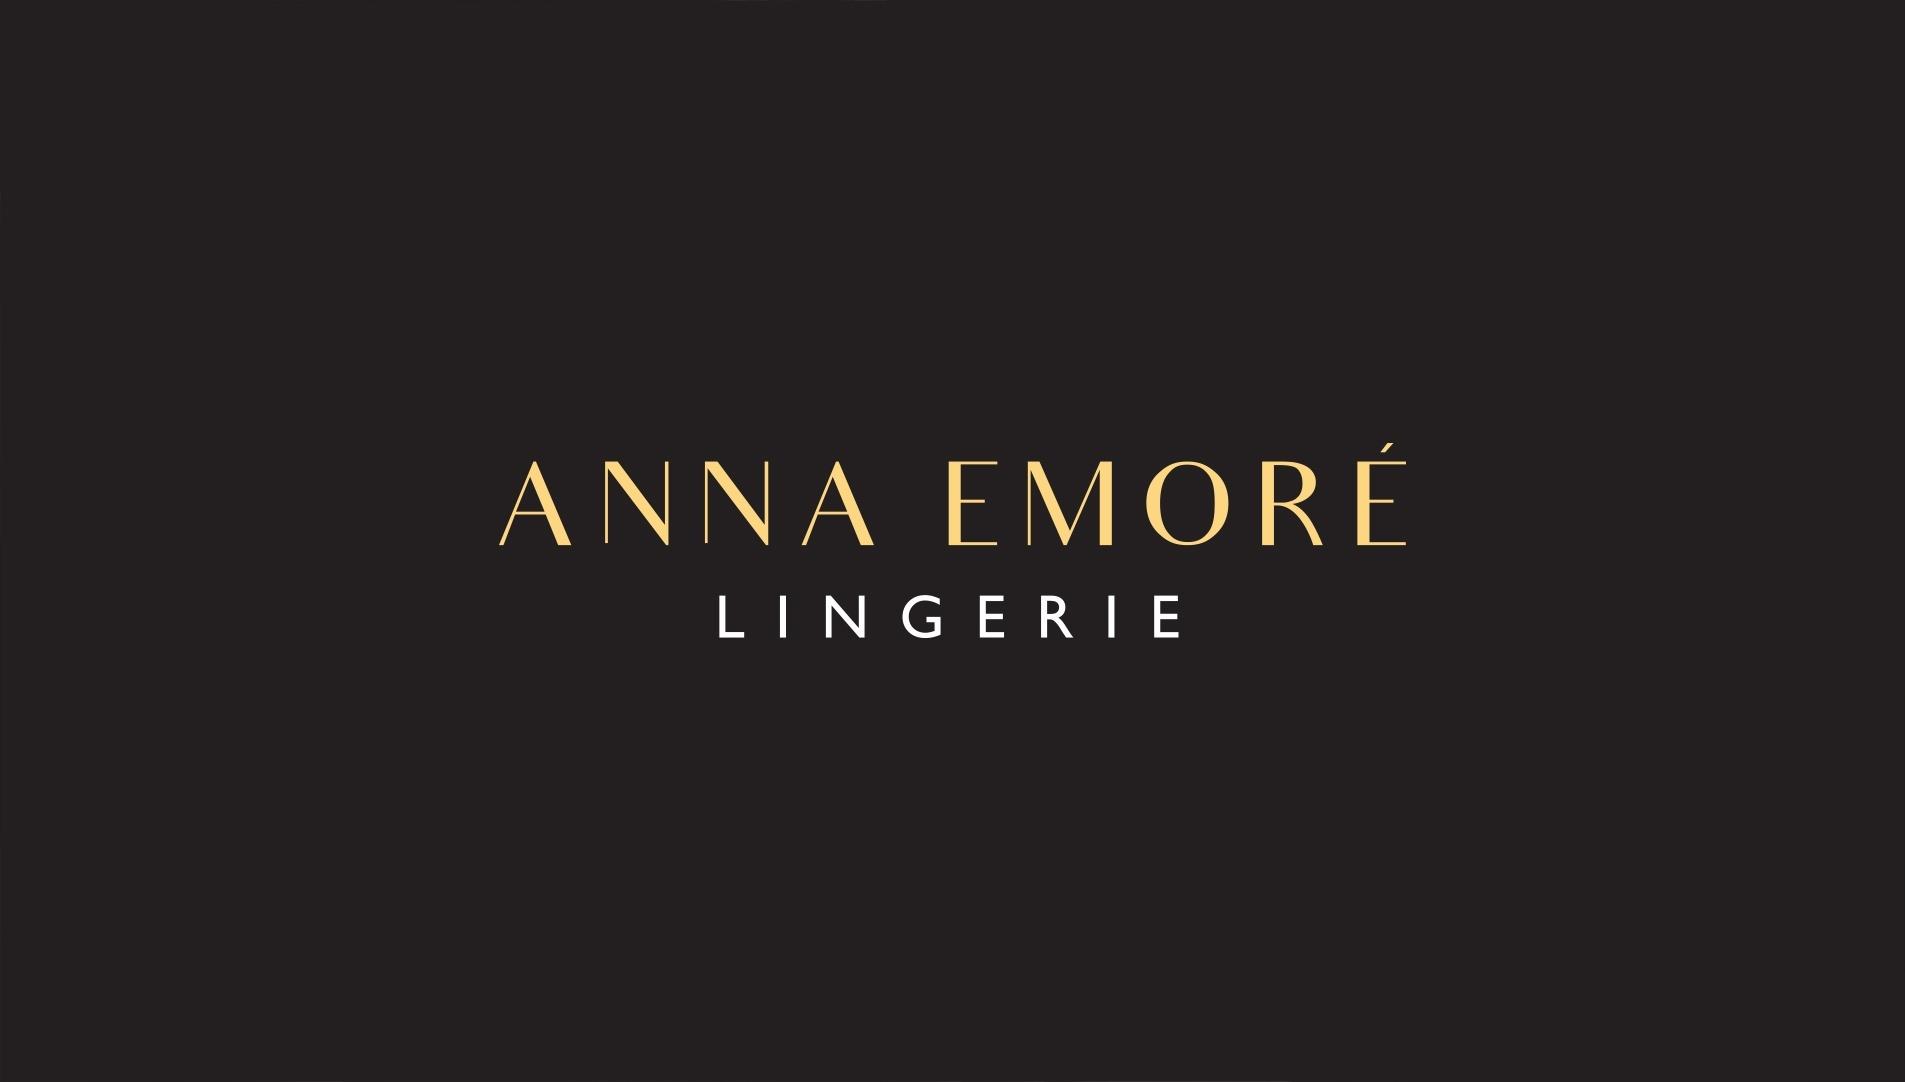 branding agency anna emore slideshow 01